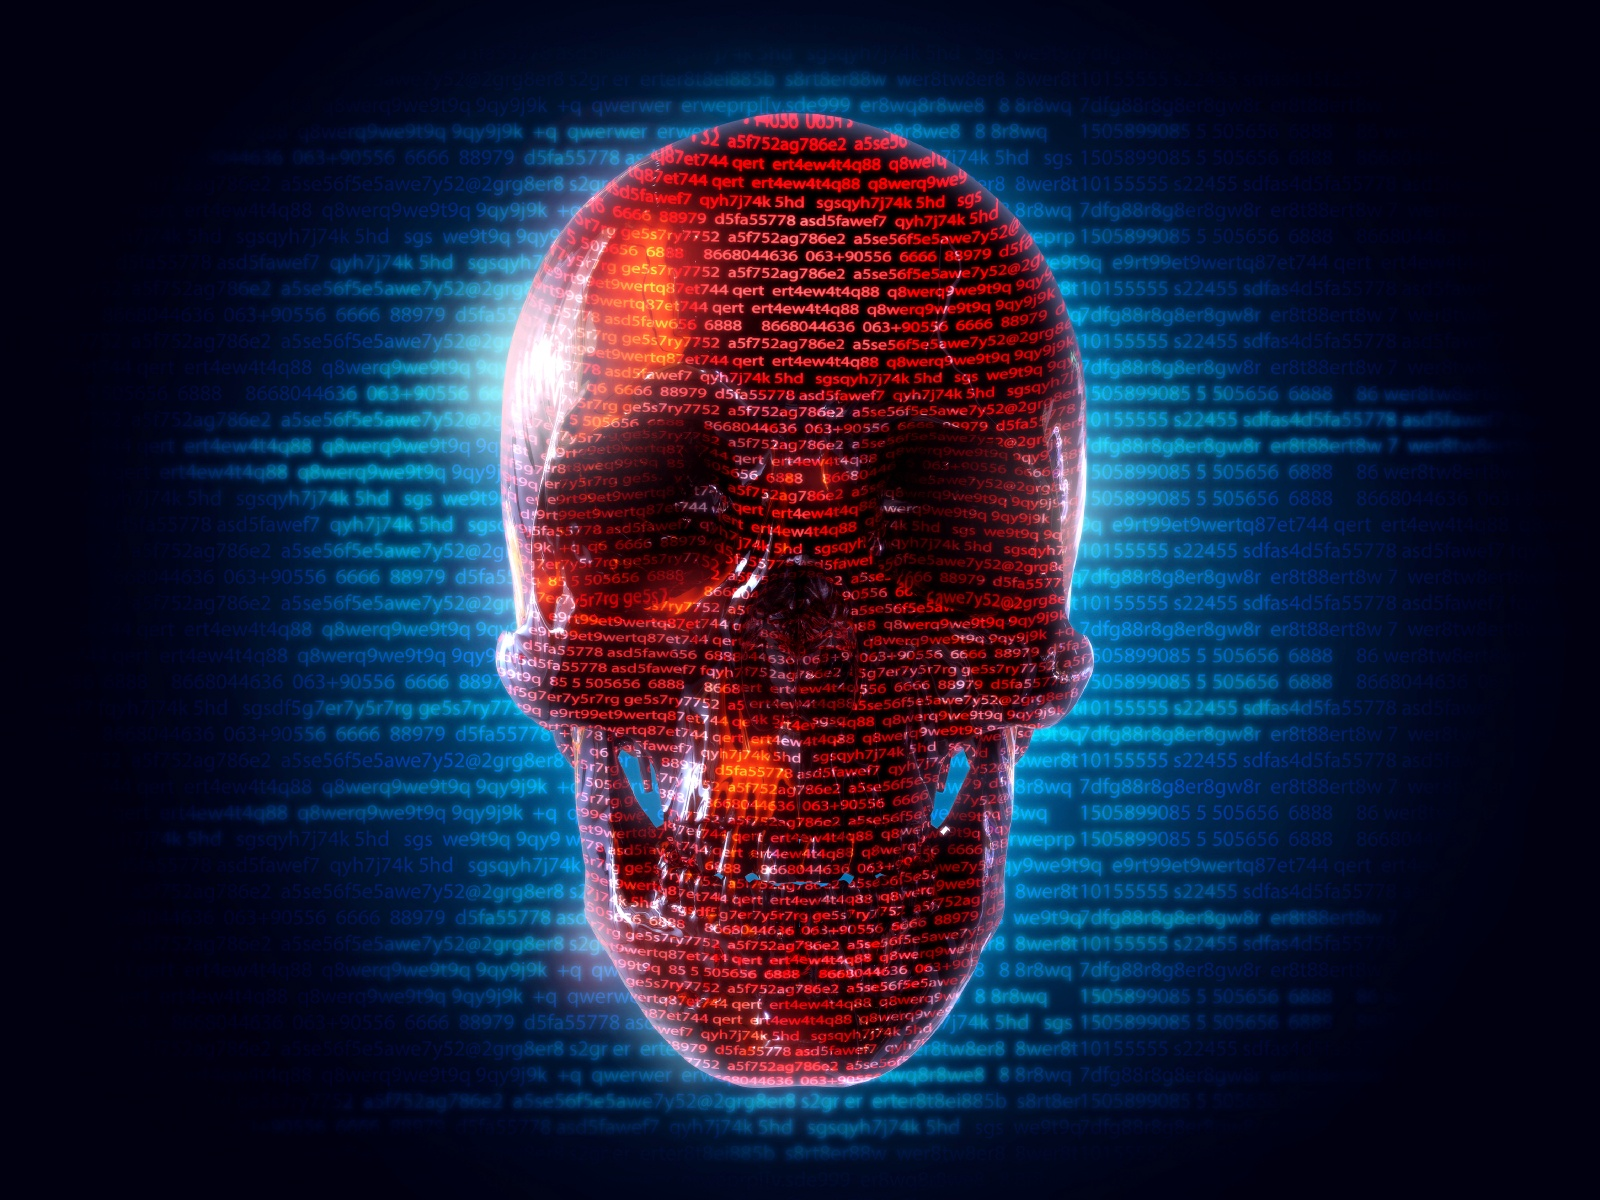 Petya: A New Ransomware Threat